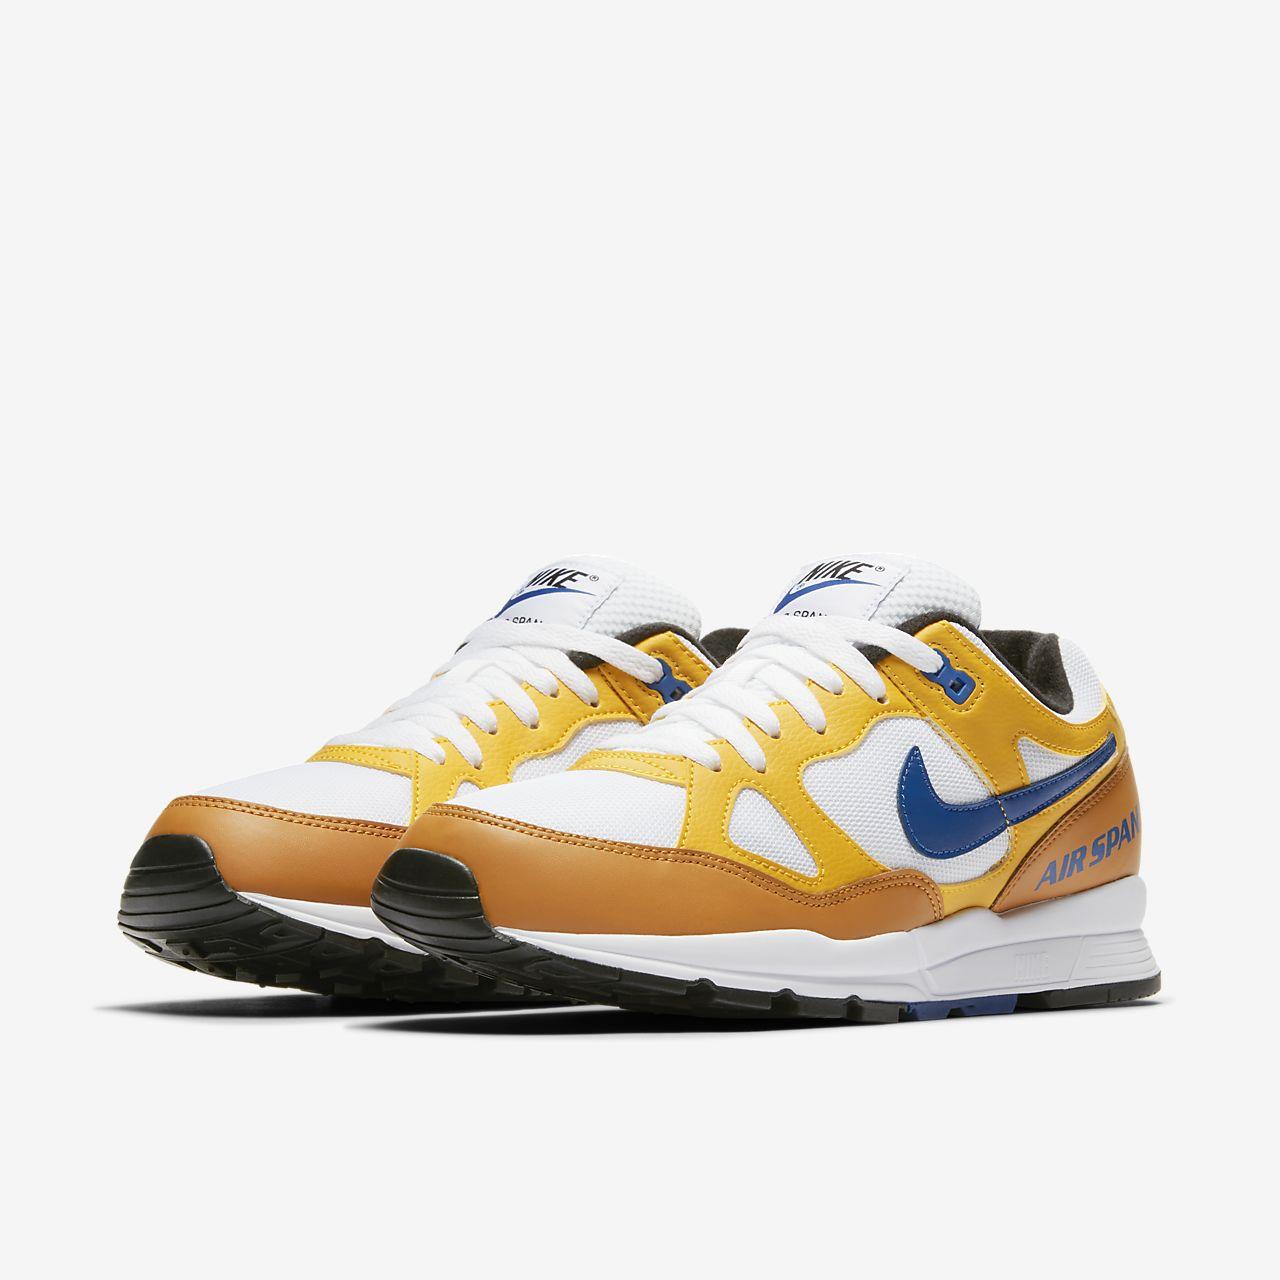 reputable site 45b54 885f3 ... Sko Nike Air Span II för män